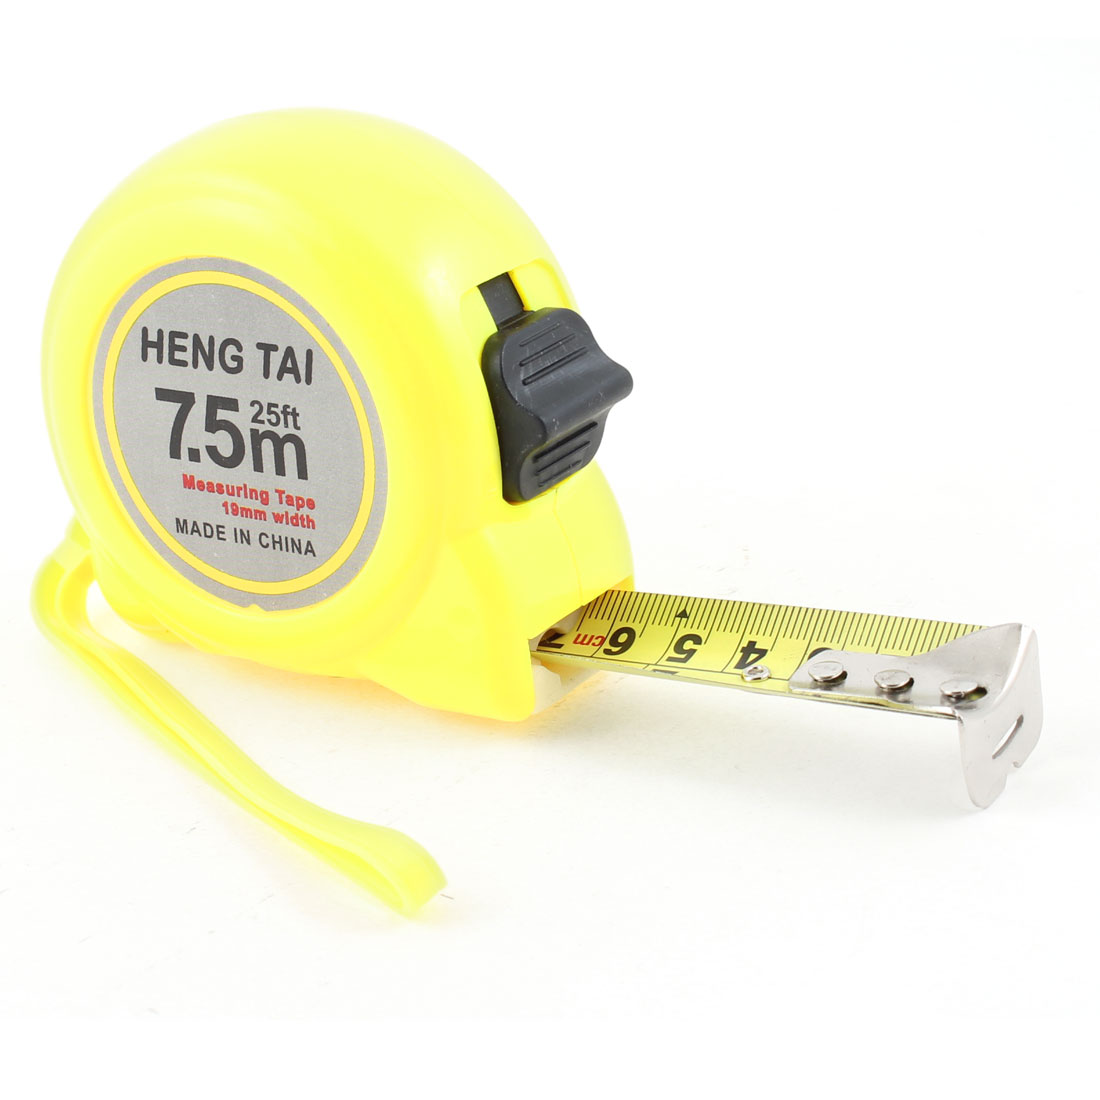 Manual Lock 7.5M 25Ft Flexible Measuring Tape Bandtape Yellow w Hand Strap